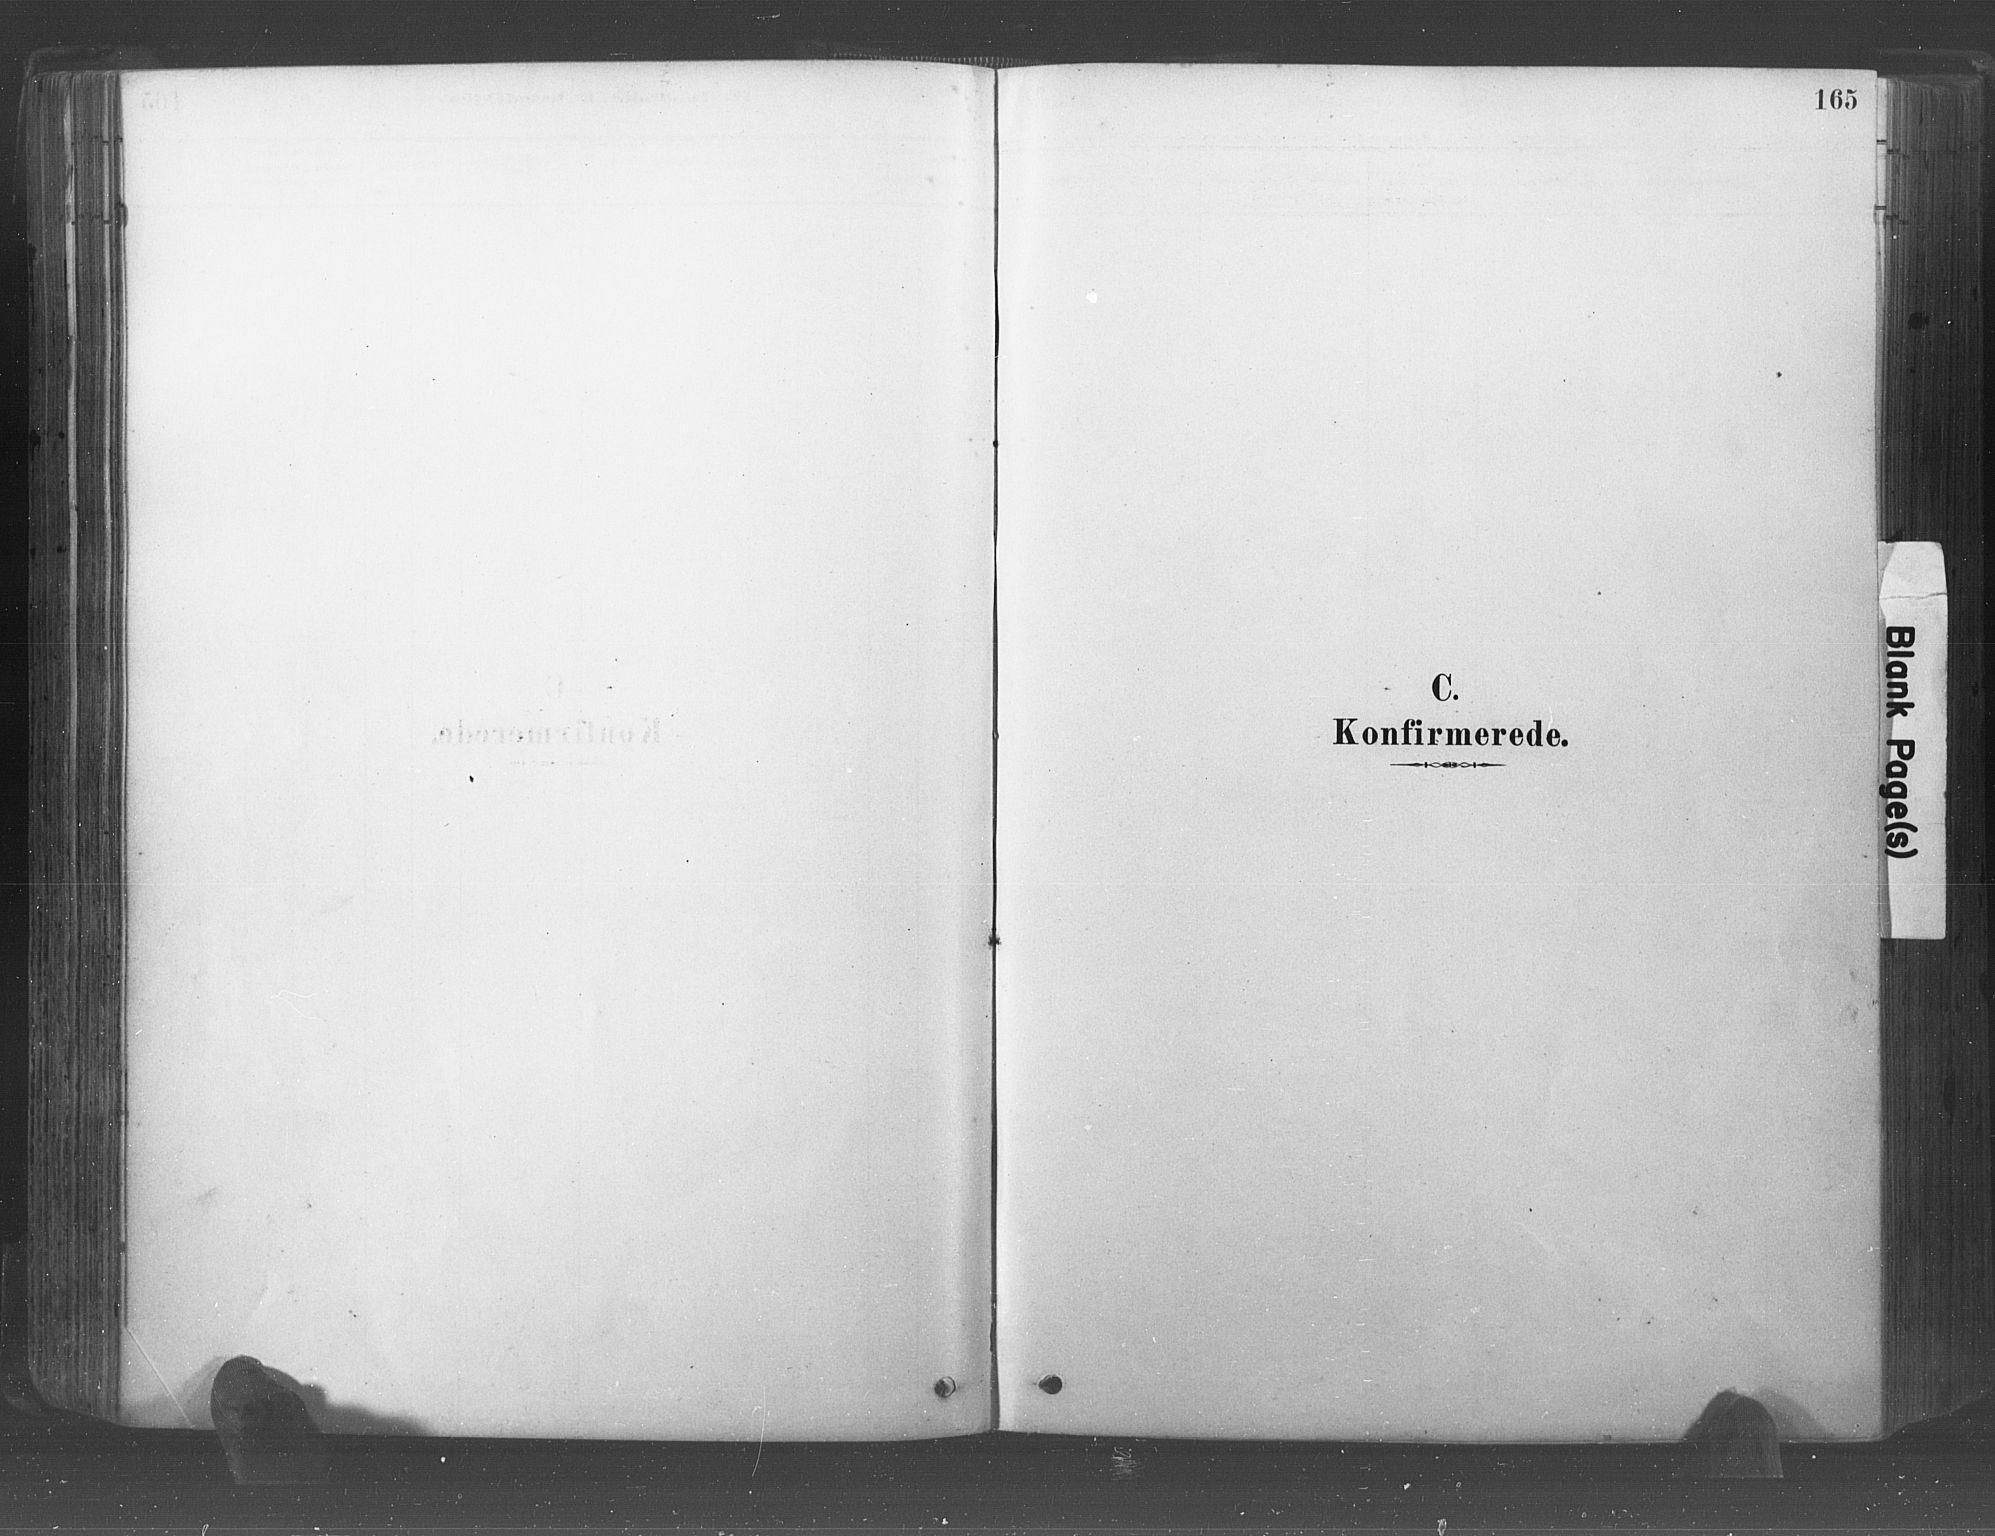 SAO, Råde prestekontor kirkebøker, F/Fa/L0007: Ministerialbok nr. 7, 1878-1902, s. 165